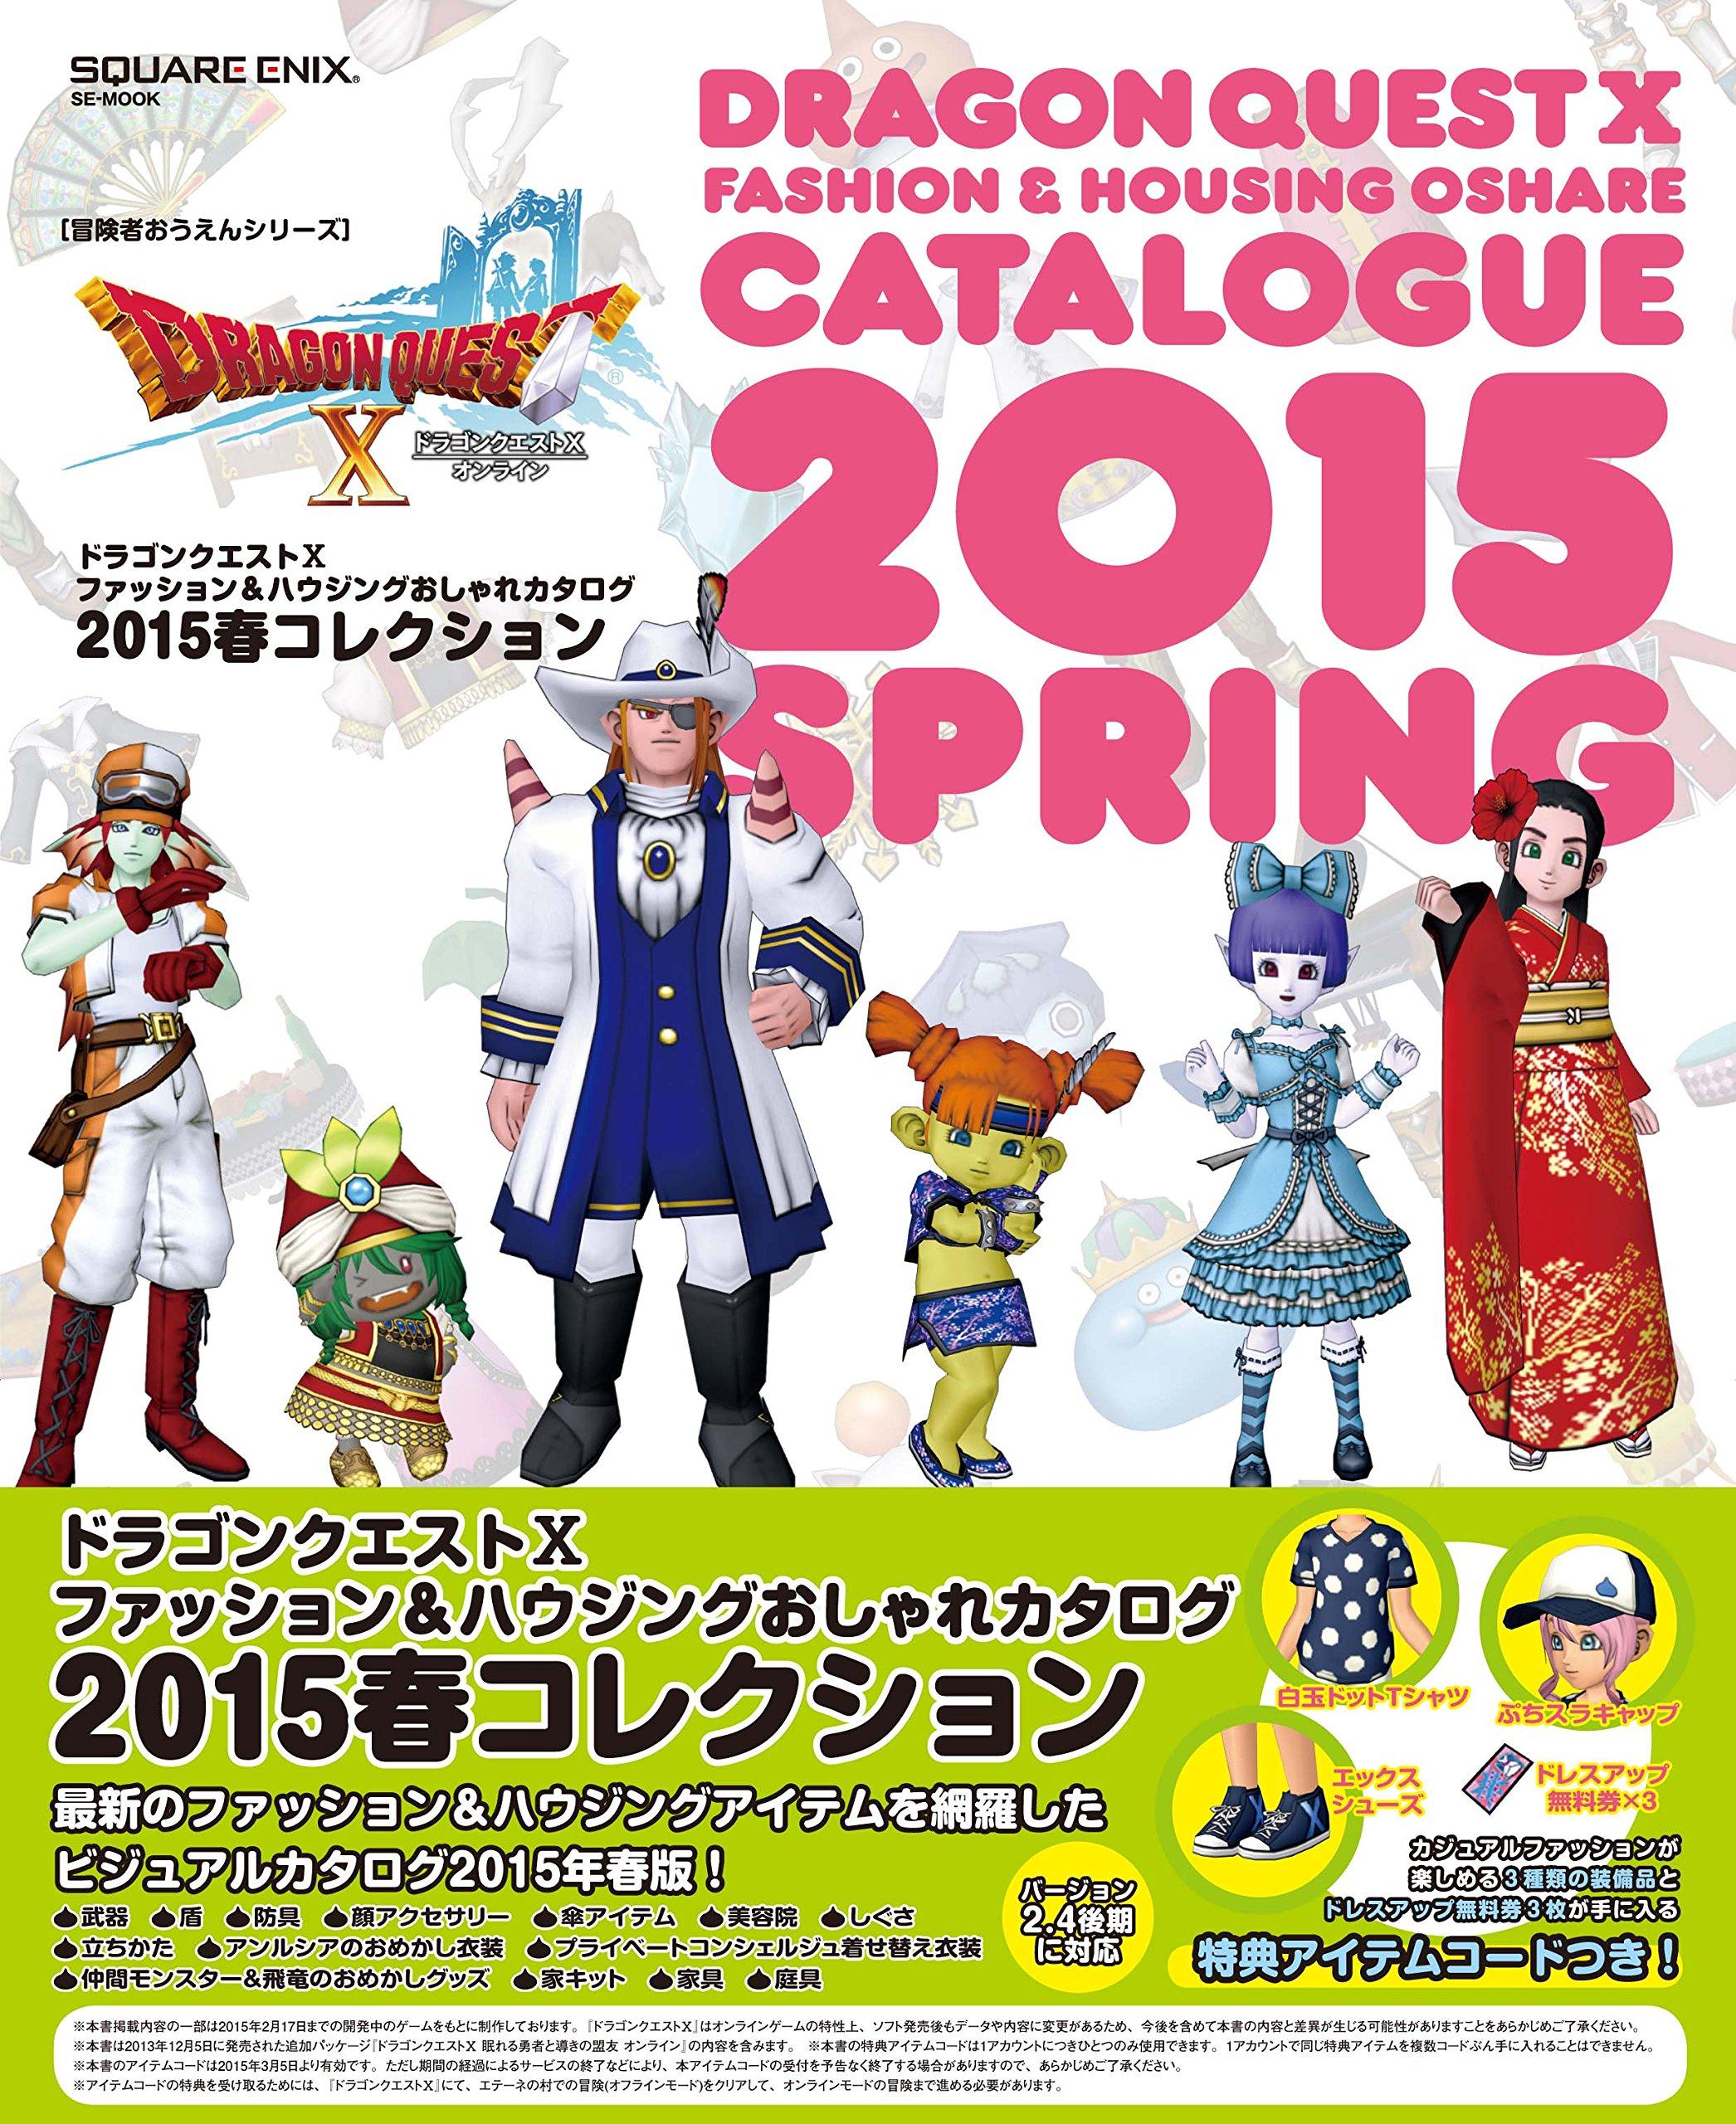 http://blog.jp.square-enix.com/magazine/dqx_guide/b41a6f84dab41621a8d844003a5ac237dabffe42.jpg